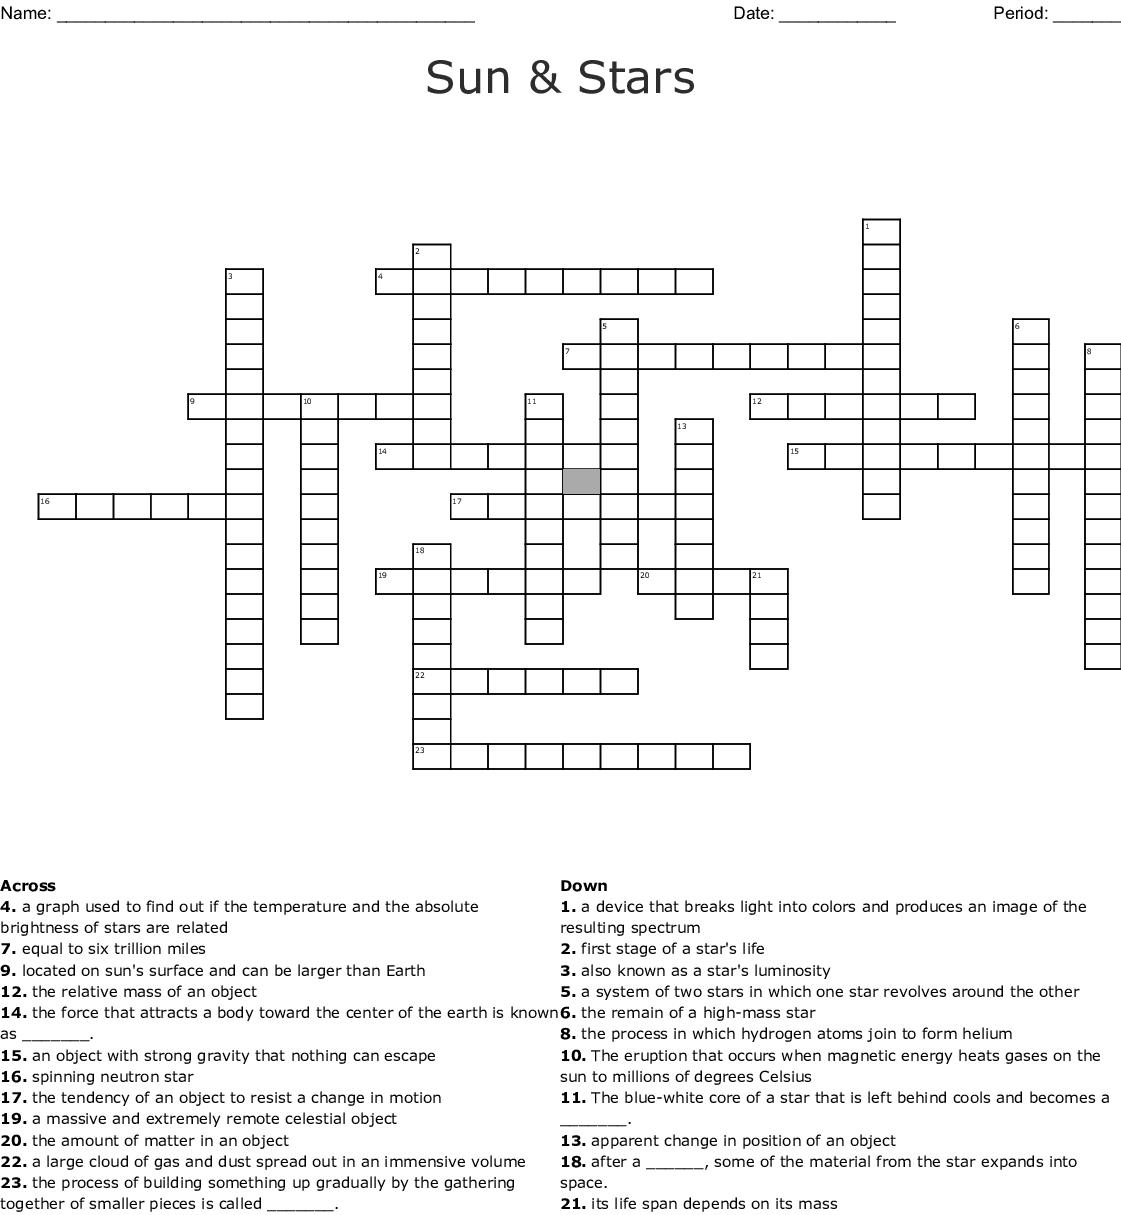 Sun & Stars Crossword - Wordmint - Star Crossword Puzzles Printable